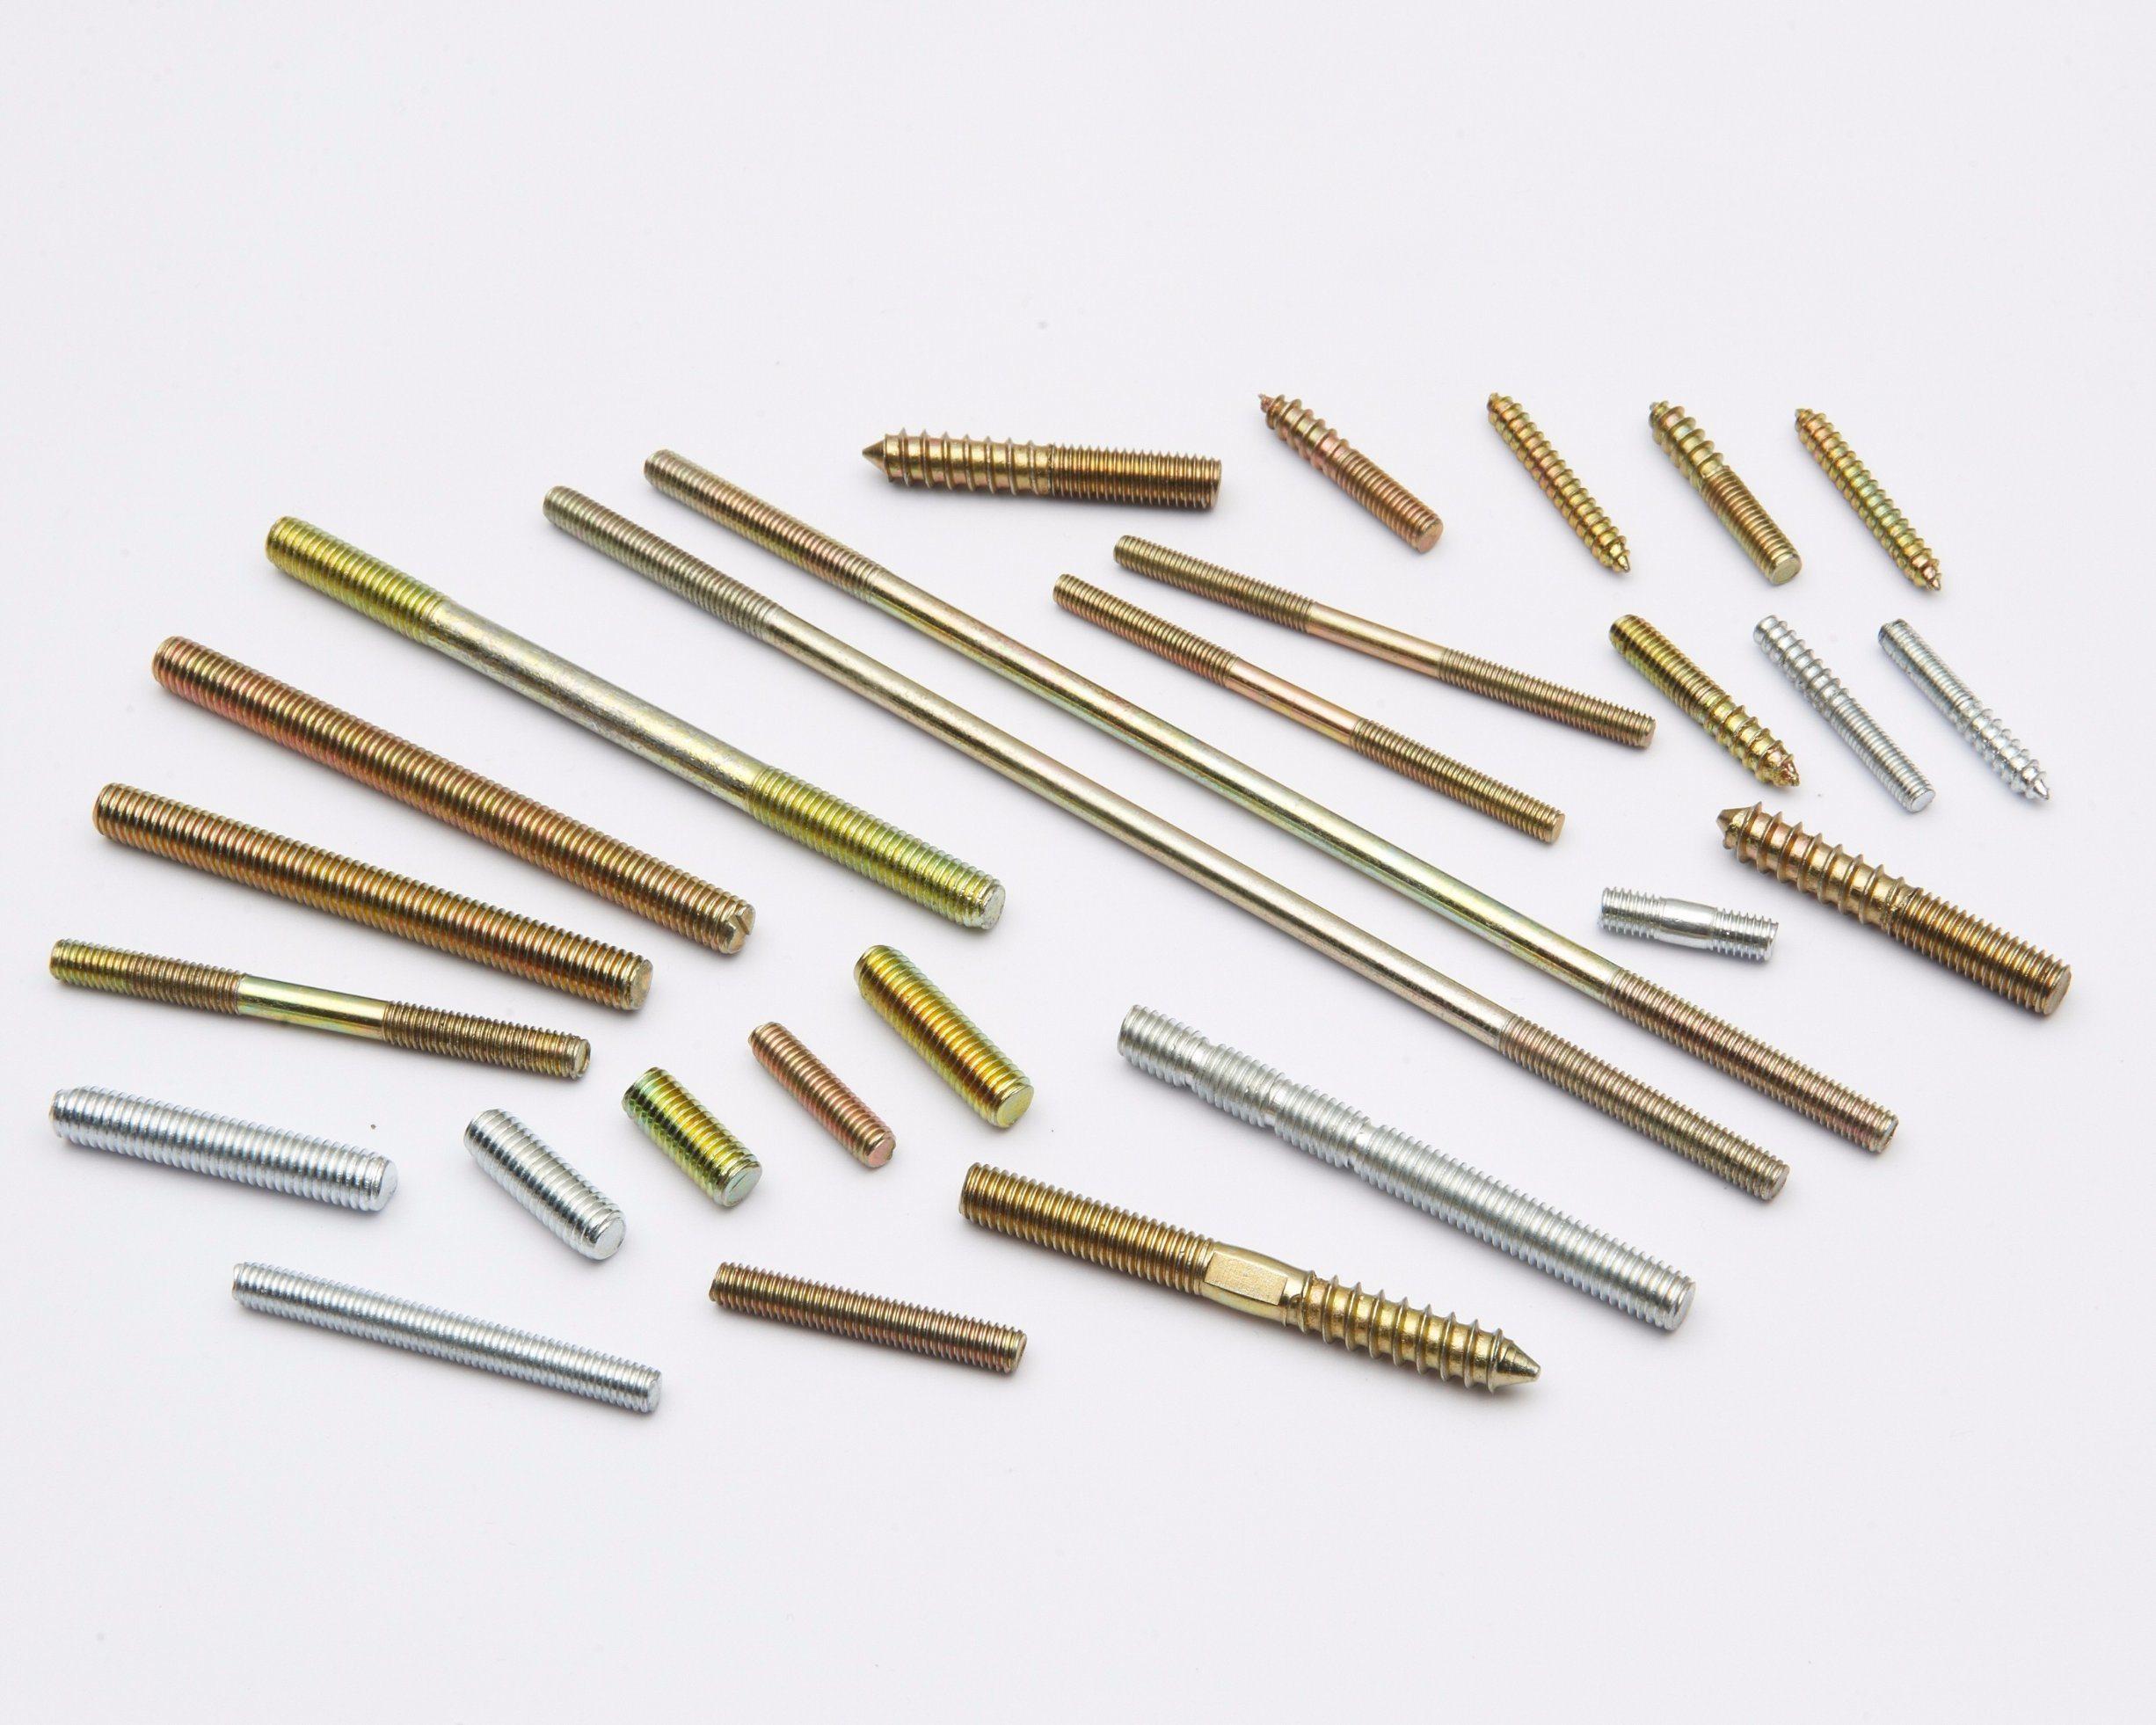 High Strength Steel, Hexagon Socket-Head Shoulder Screws, Class 12.9 10.9 8.8, 4.8 M6-M20, OEM